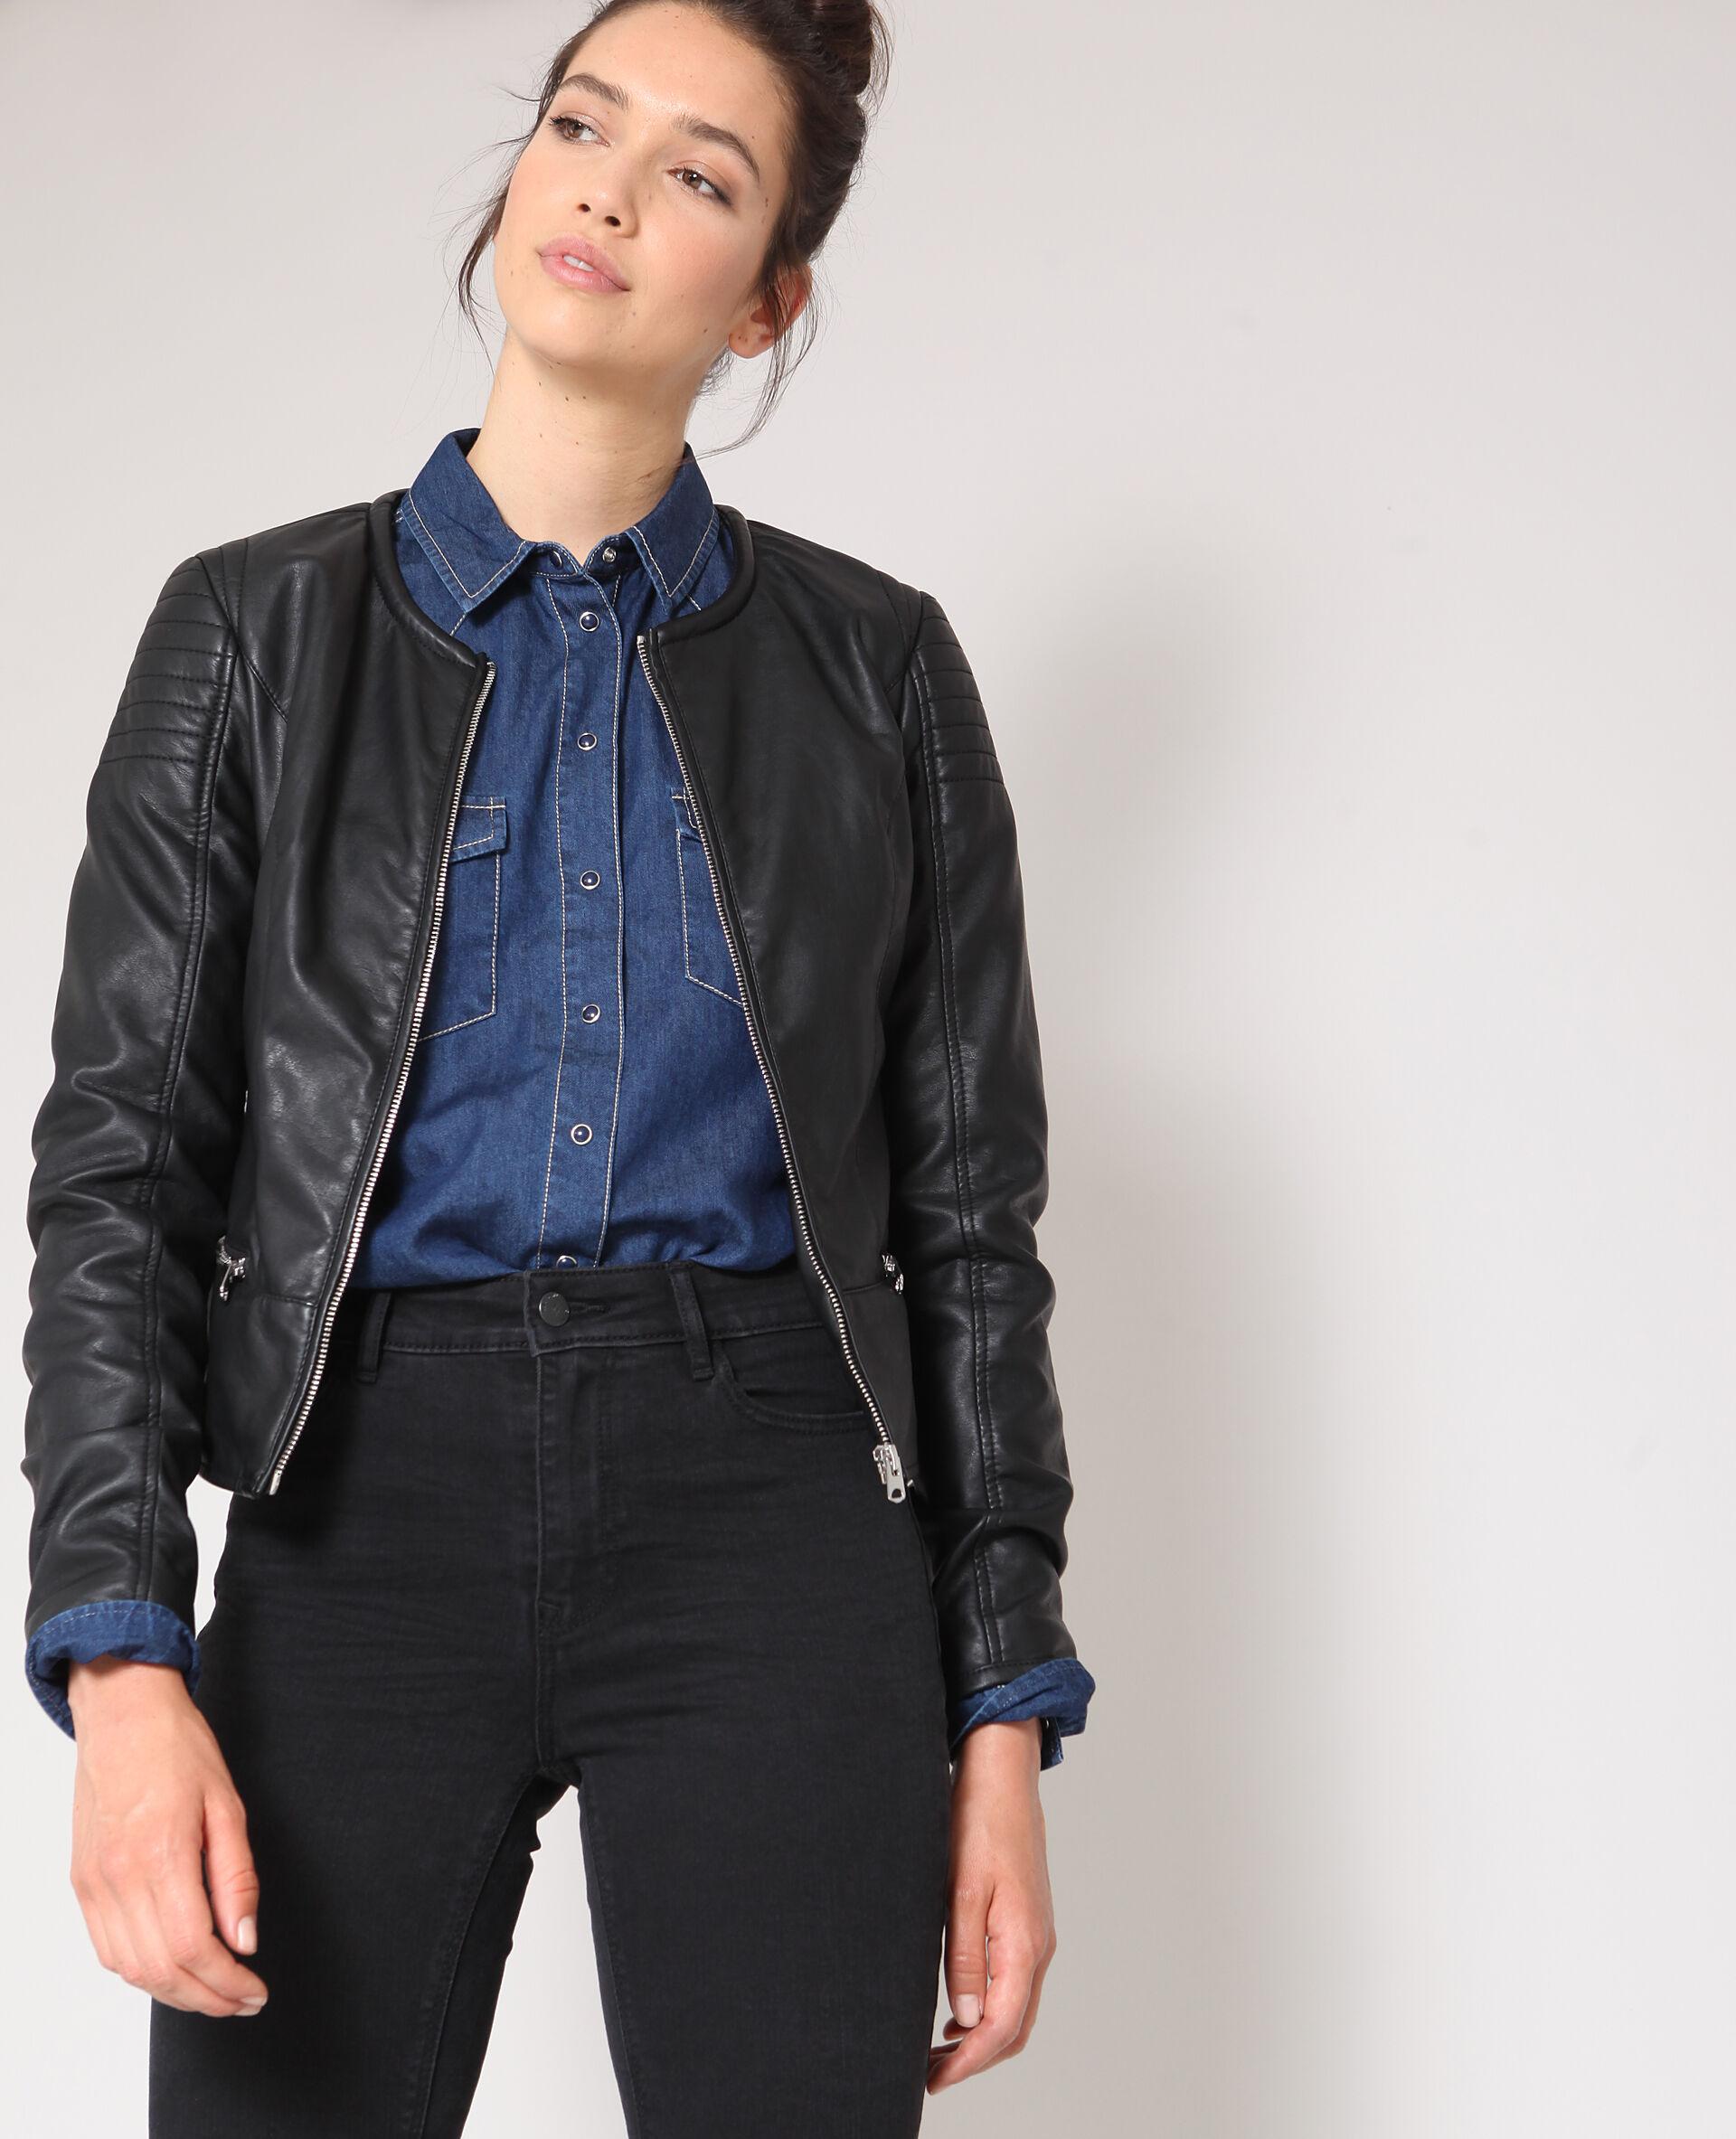 Veste simili cuir femme bleu